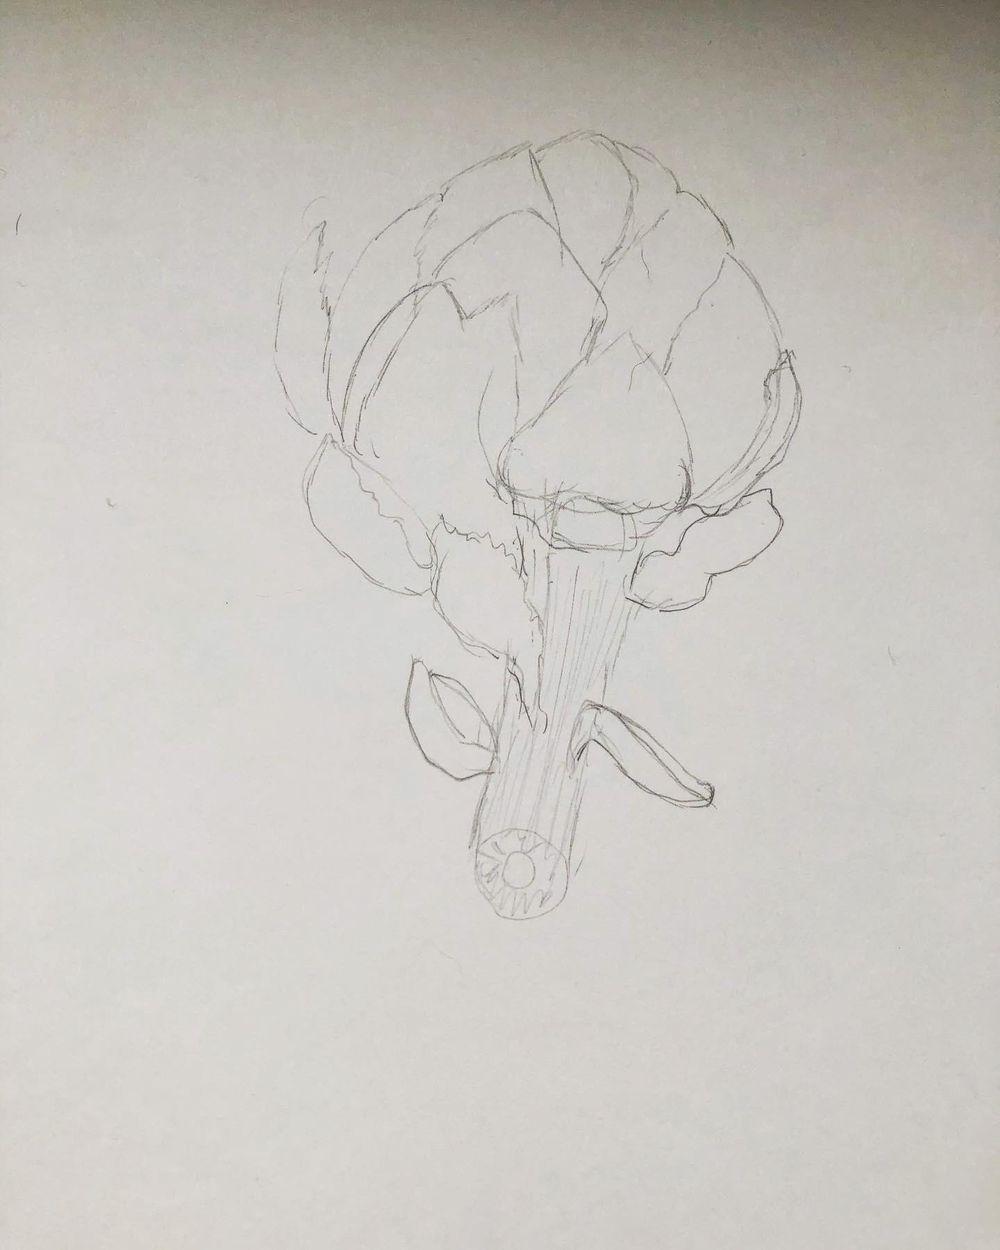 Exploration - artichoke drawings - image 5 - student project